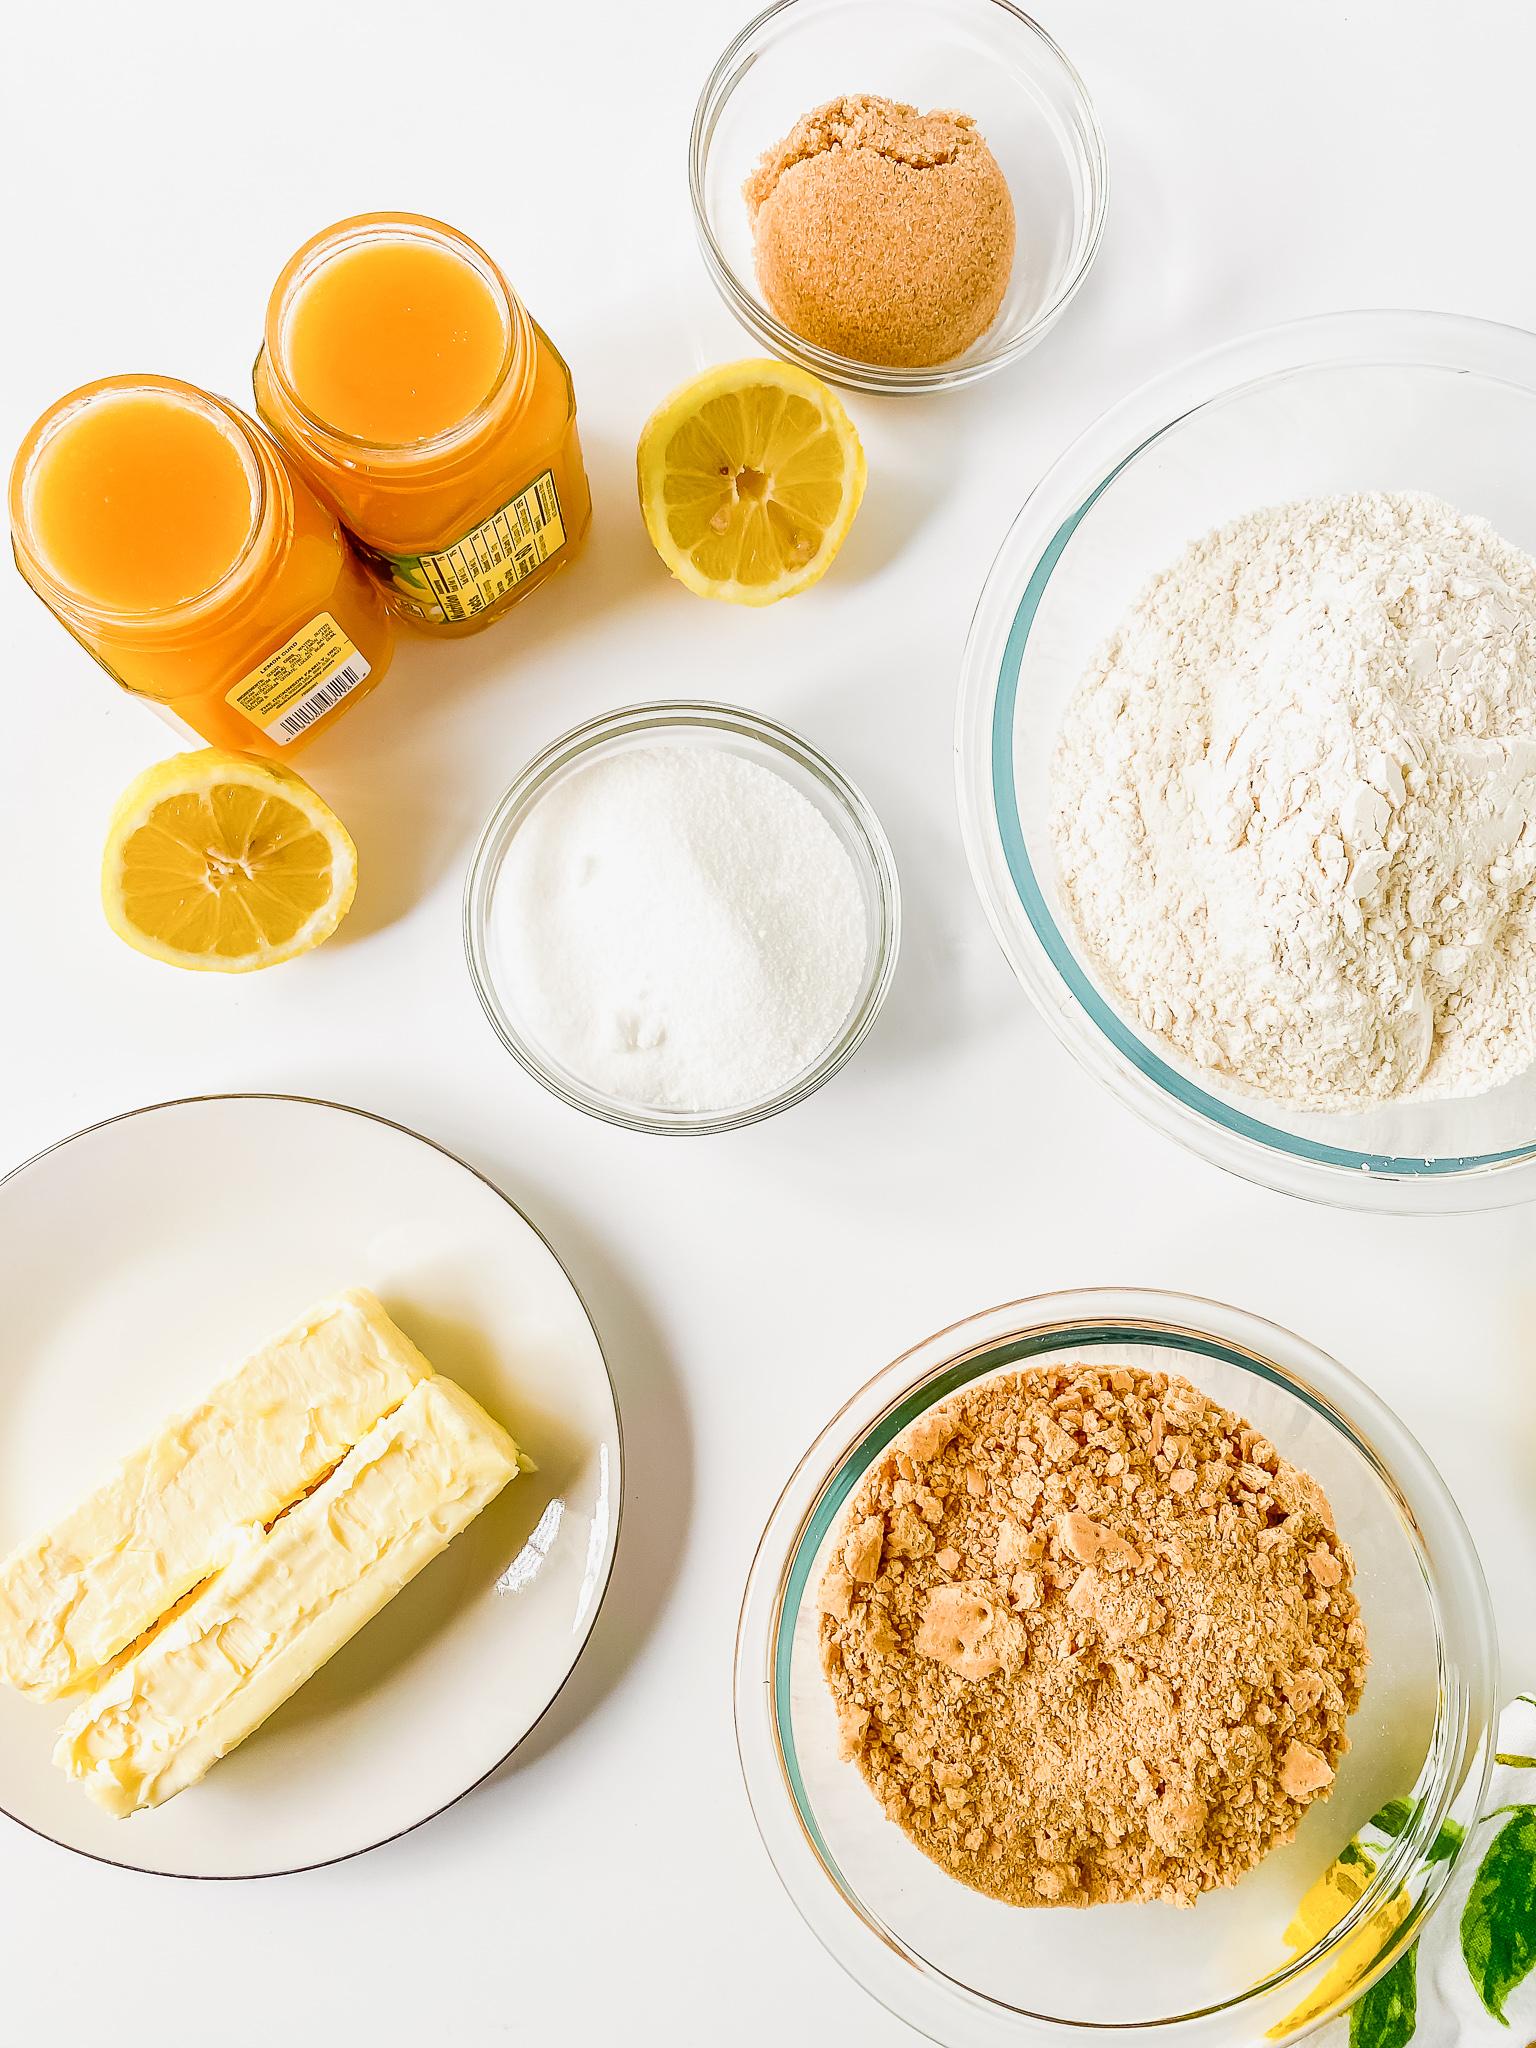 ingredients for lemon bars recipe